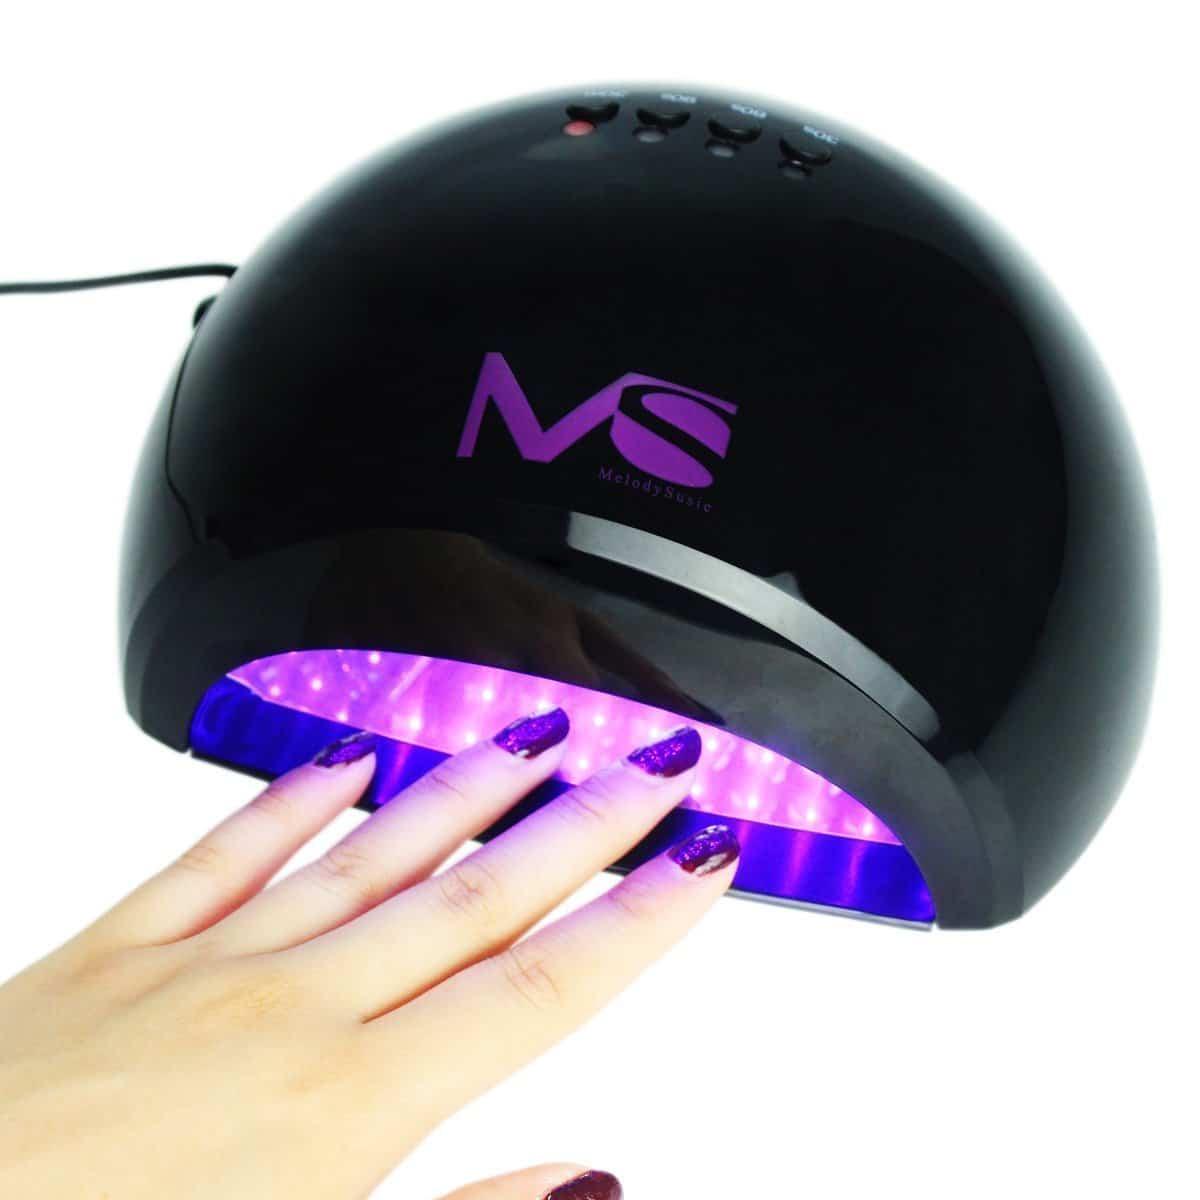 acheter la lampe led m lodysusie violetili mes petits ongles. Black Bedroom Furniture Sets. Home Design Ideas